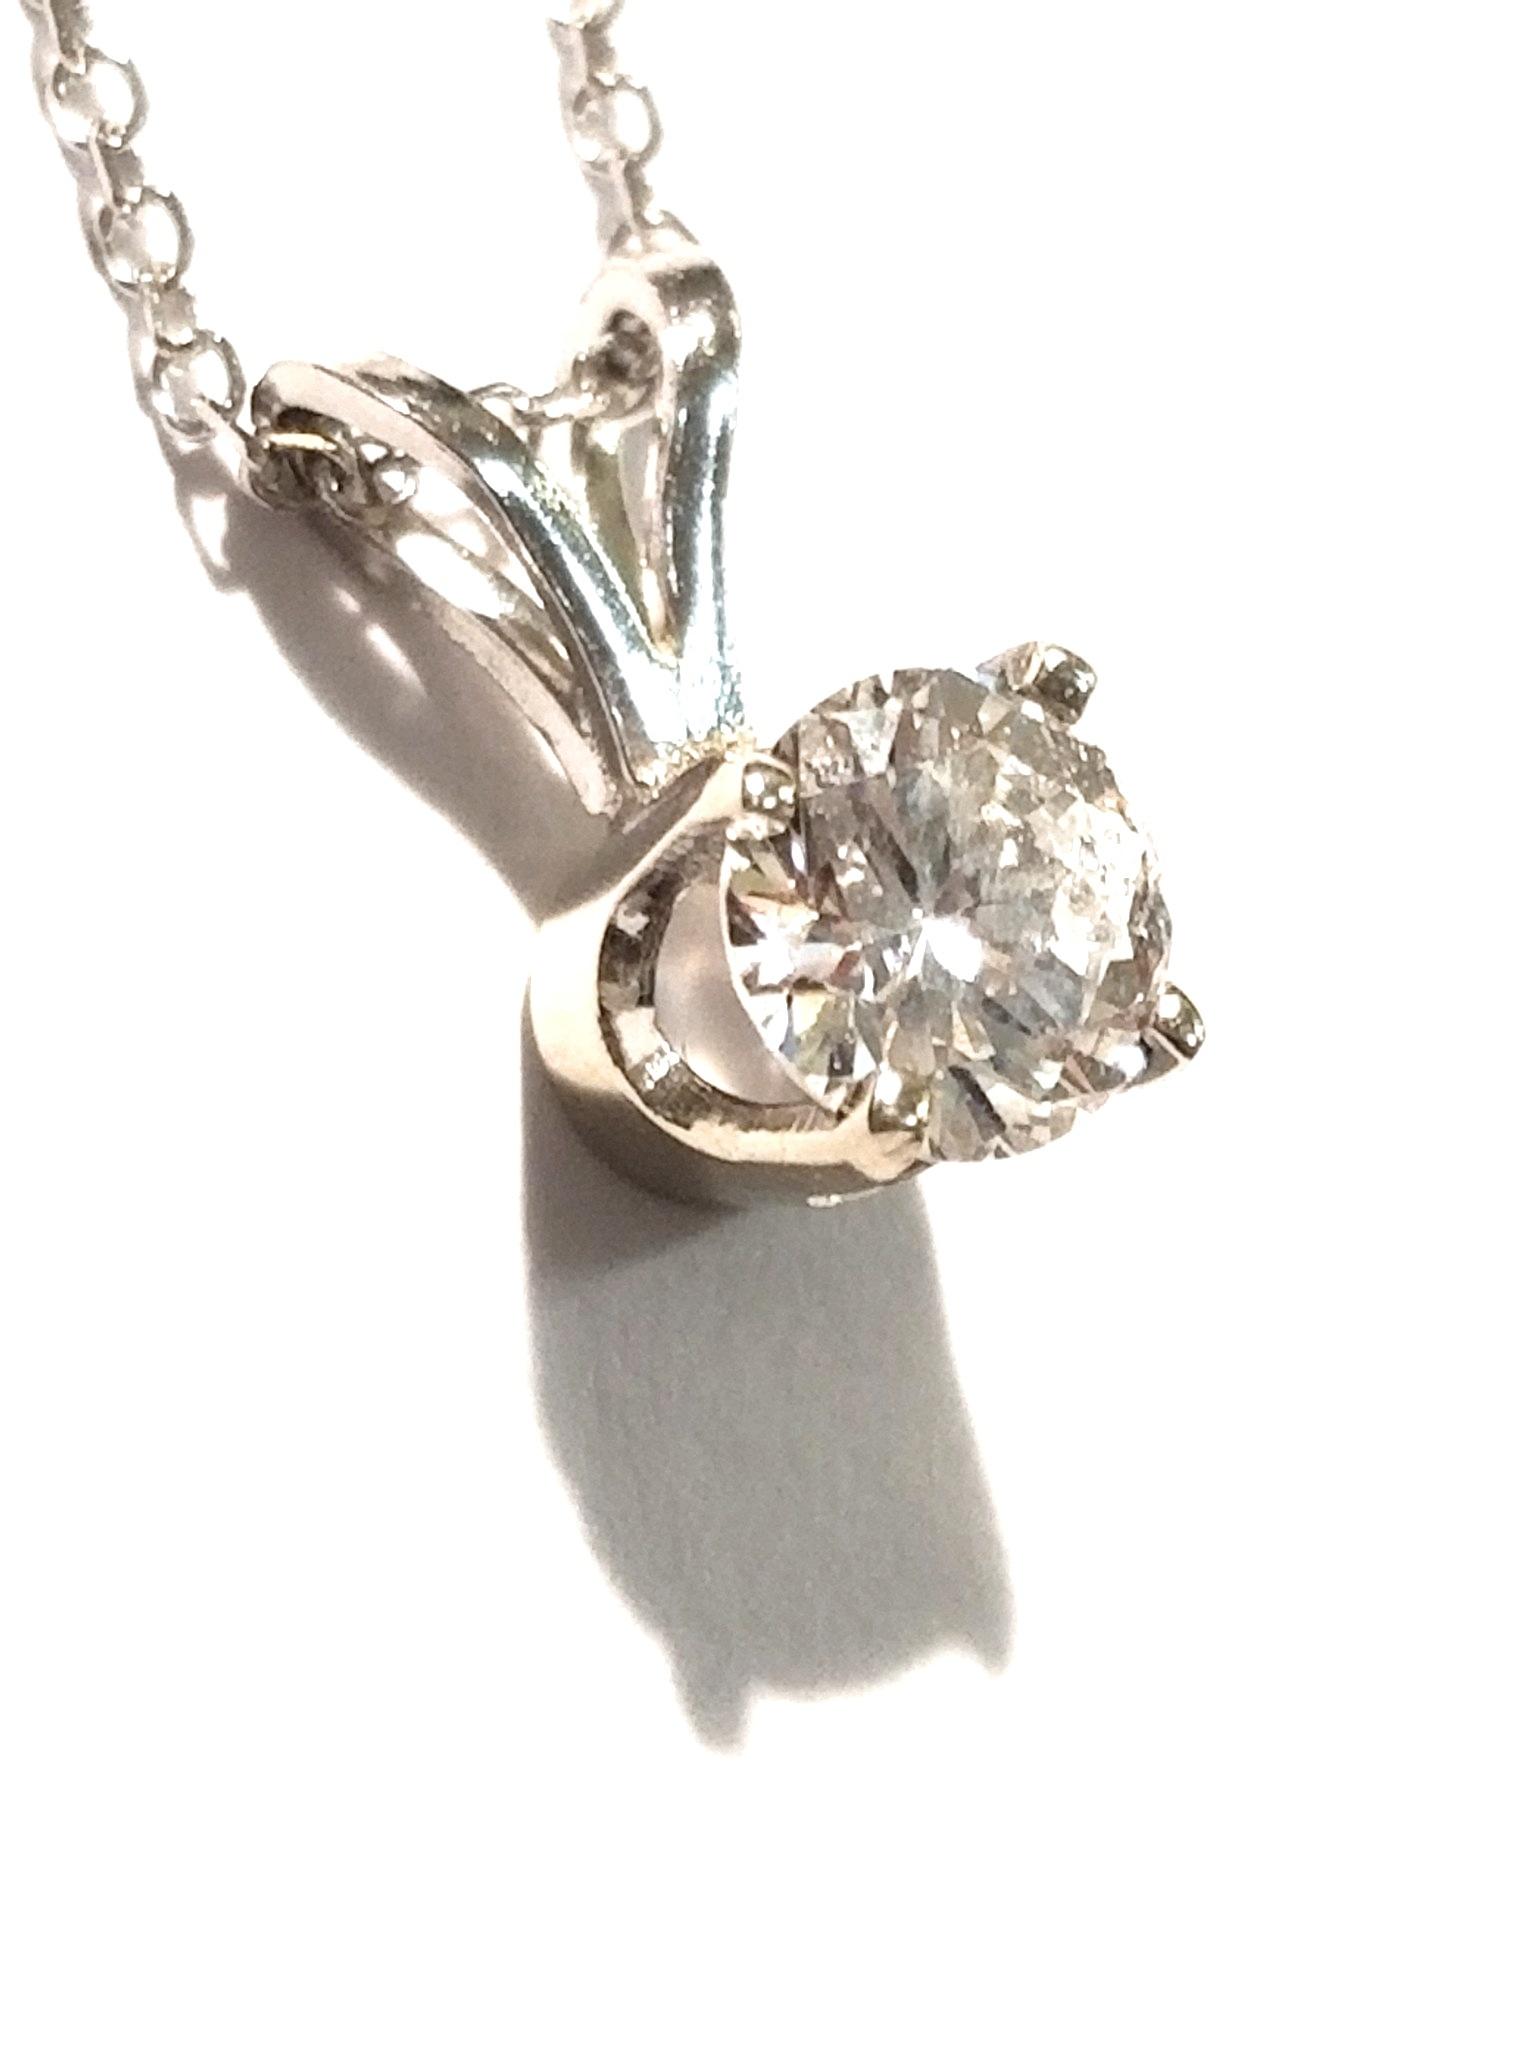 14k wg diamond solitaire pendant 4.5mm